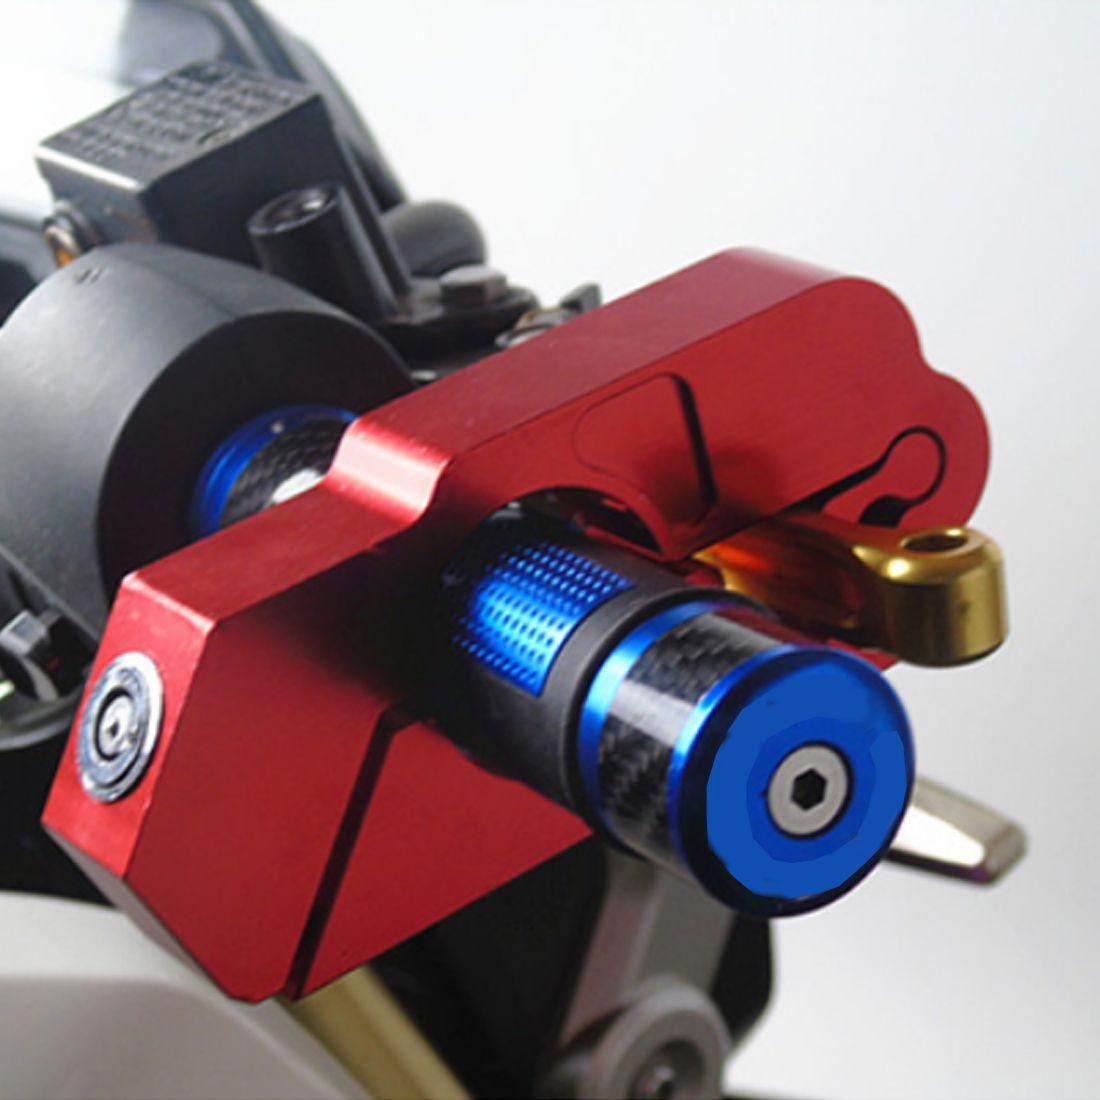 CAR-partment Motorcycle Handlebar Lock Scooter ATV <font><b>Brake</b></font> Clutch Security Safety Theft Protection Locks for Honda Yamaha Piaggio